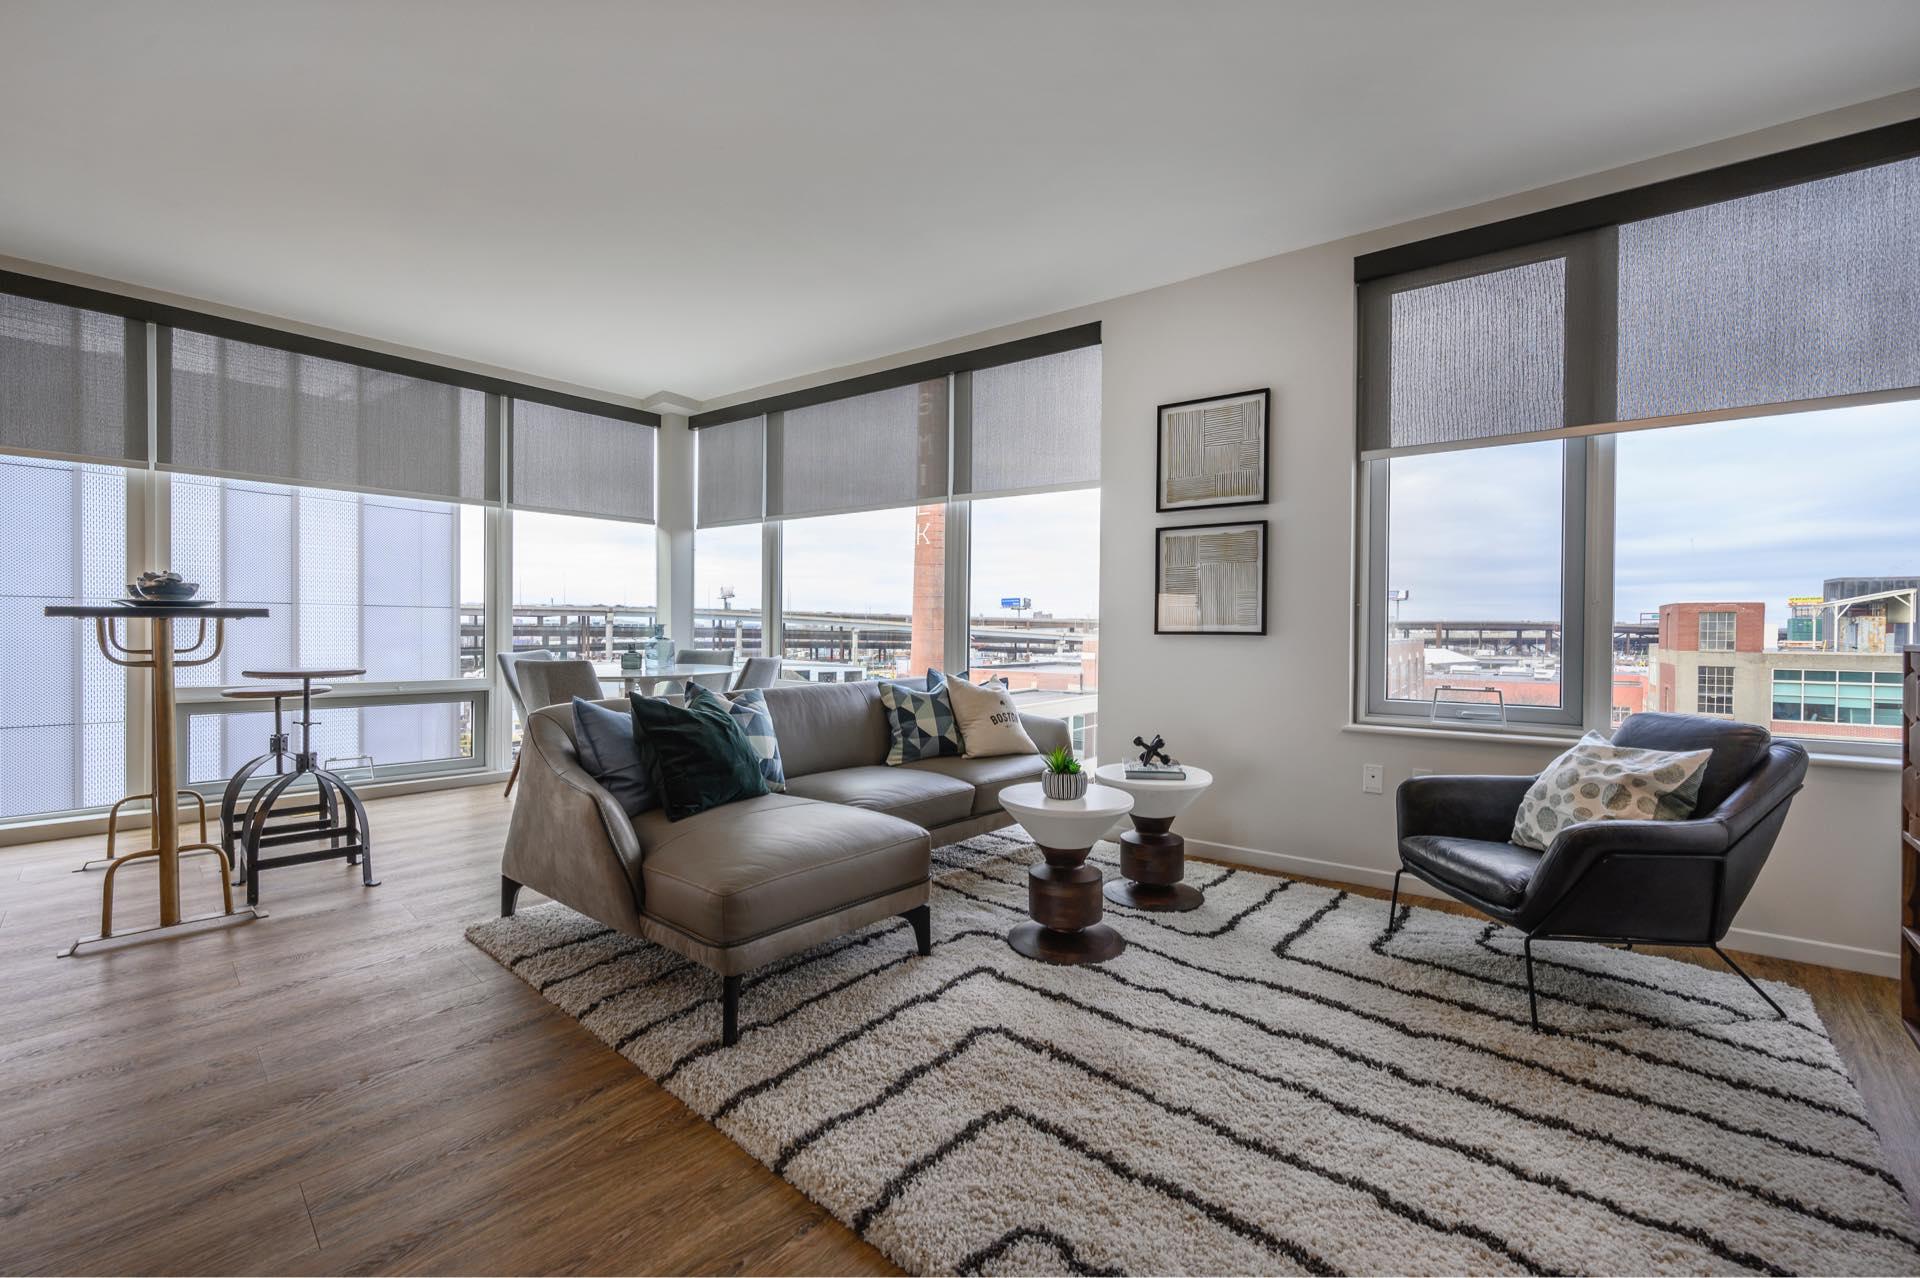 Apartments img 25